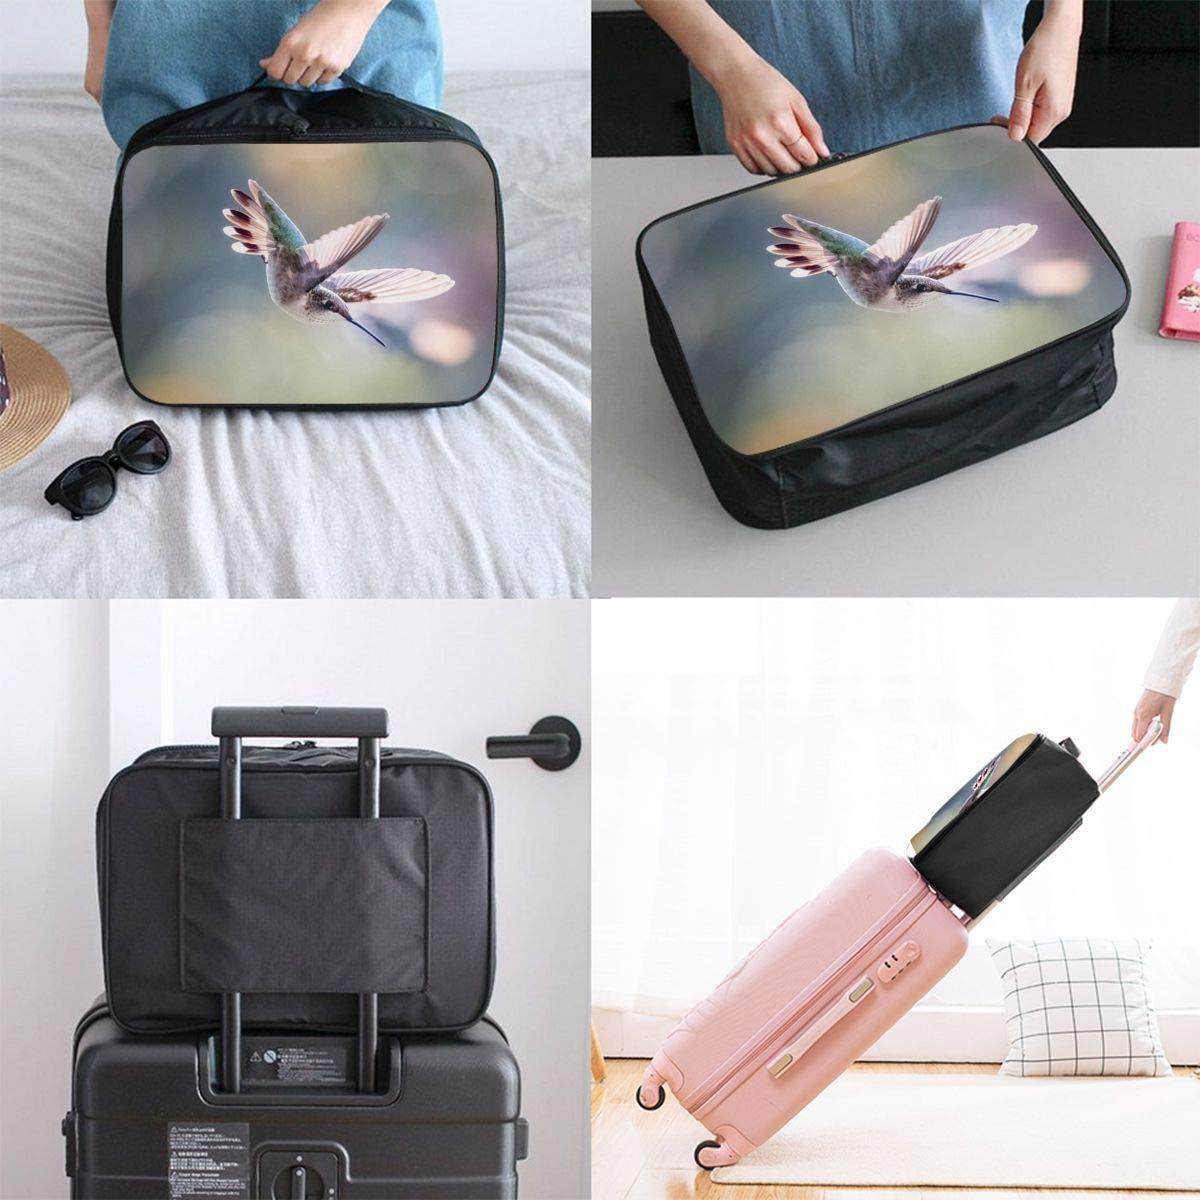 JTRVW Luggage Bags for Travel Lightweight Large Capacity Portable Duffel Bag for Men /& Women White Hummingbird Travel Duffel Bag Backpack